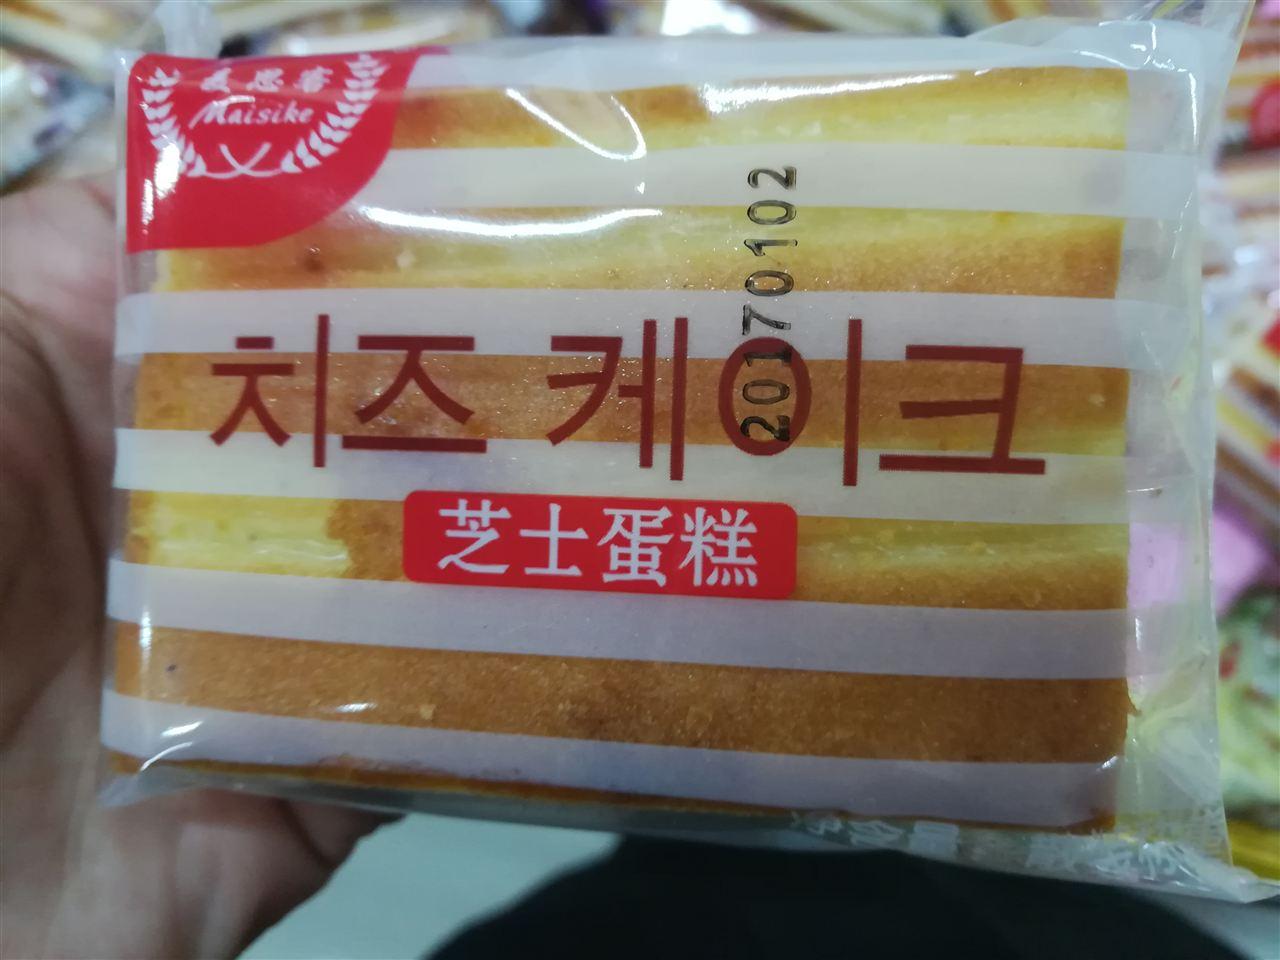 <strong><strong>广东省著名芝士蛋糕包装机设备厂家</strong> 芝士蛋糕自动包装机</strong>